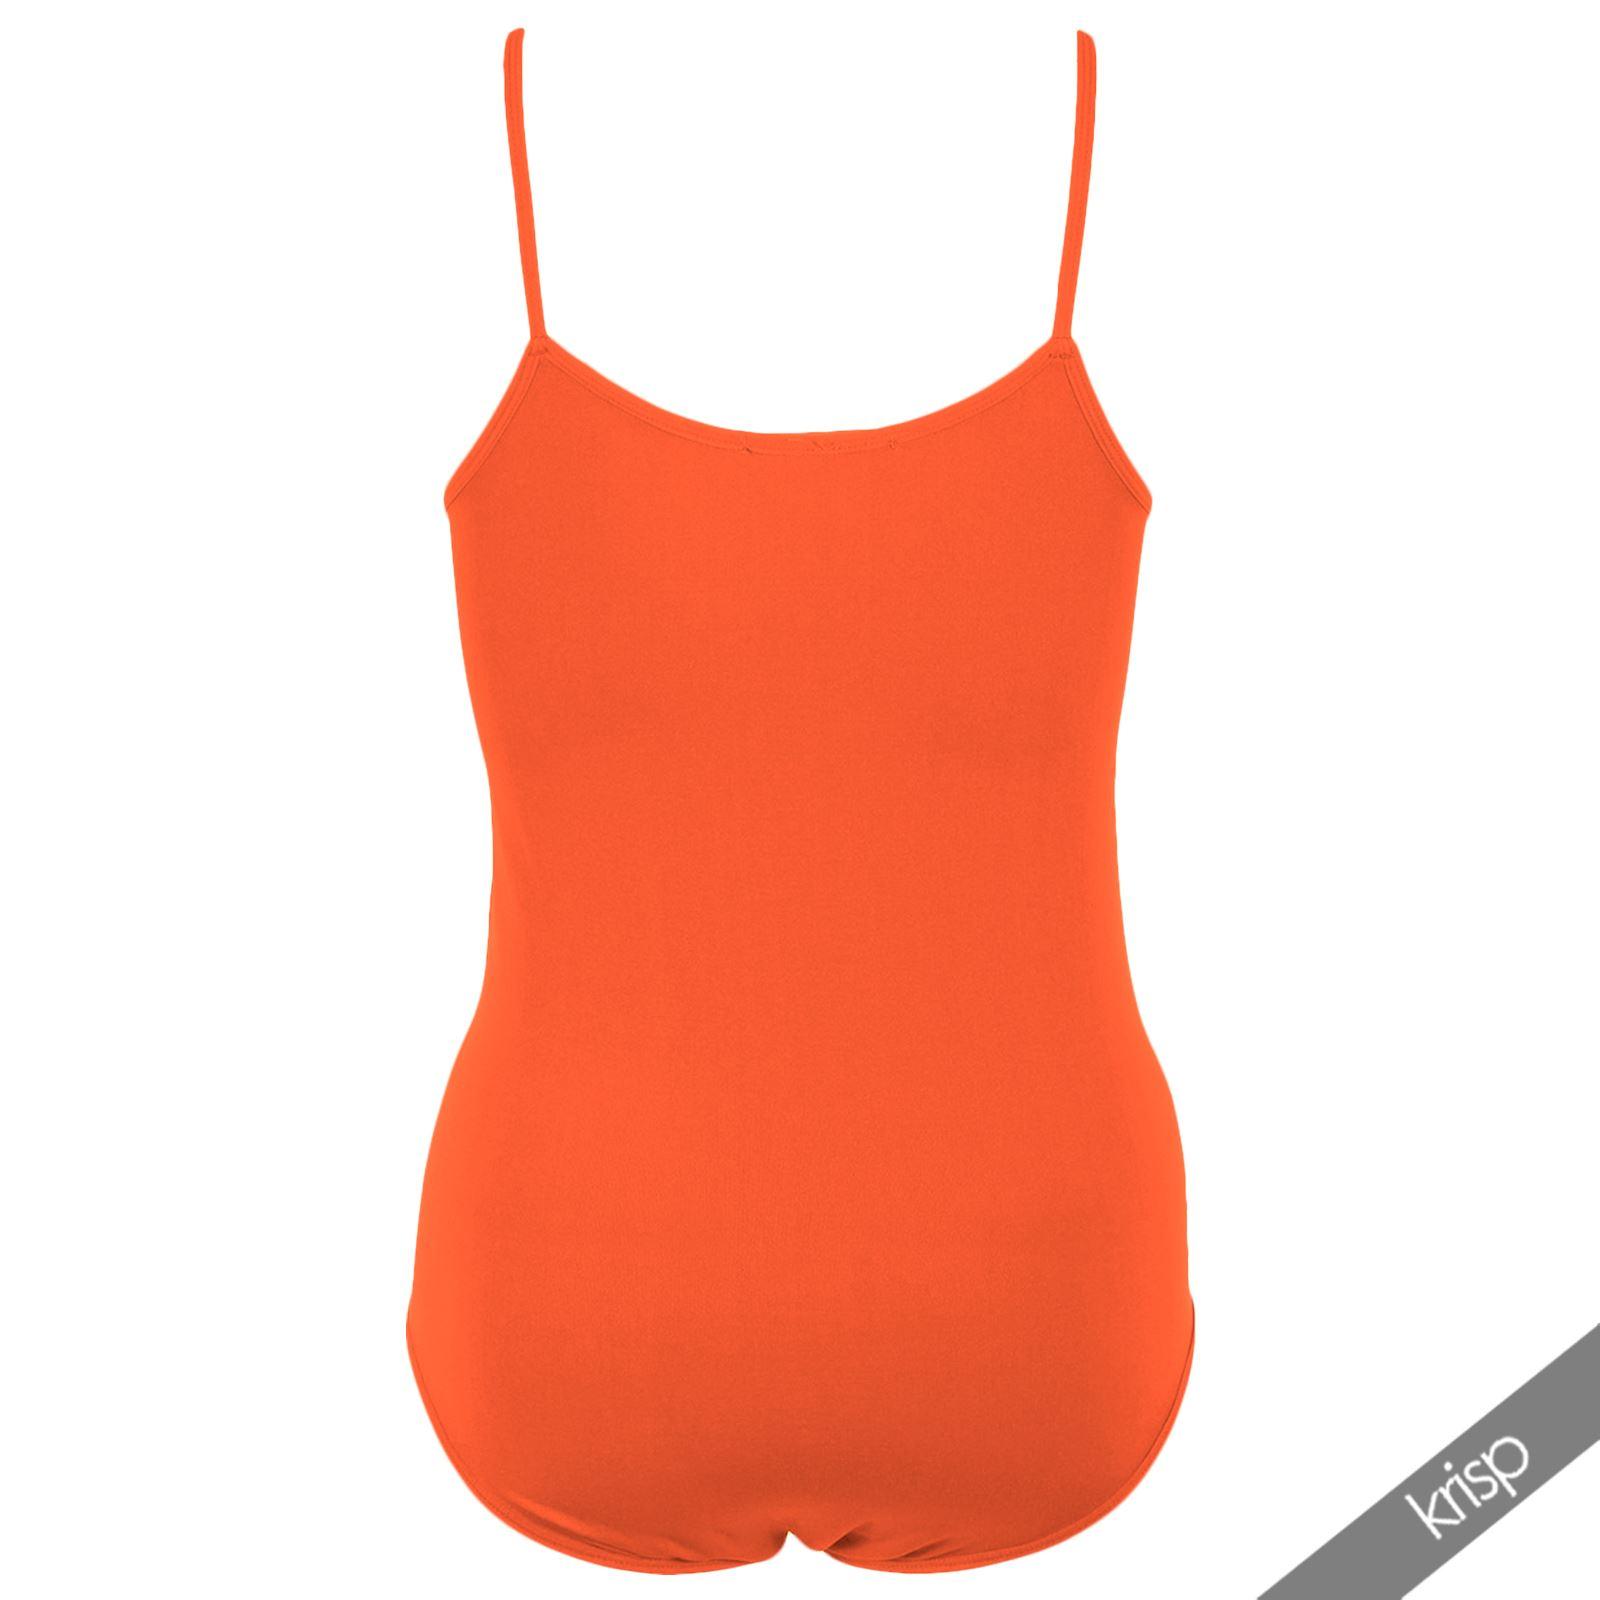 Body-Mujer-Basico-Invierno-Cuello-Barato-Top-Camiseta-Ajustado-Tirantes-Elastico miniatura 7